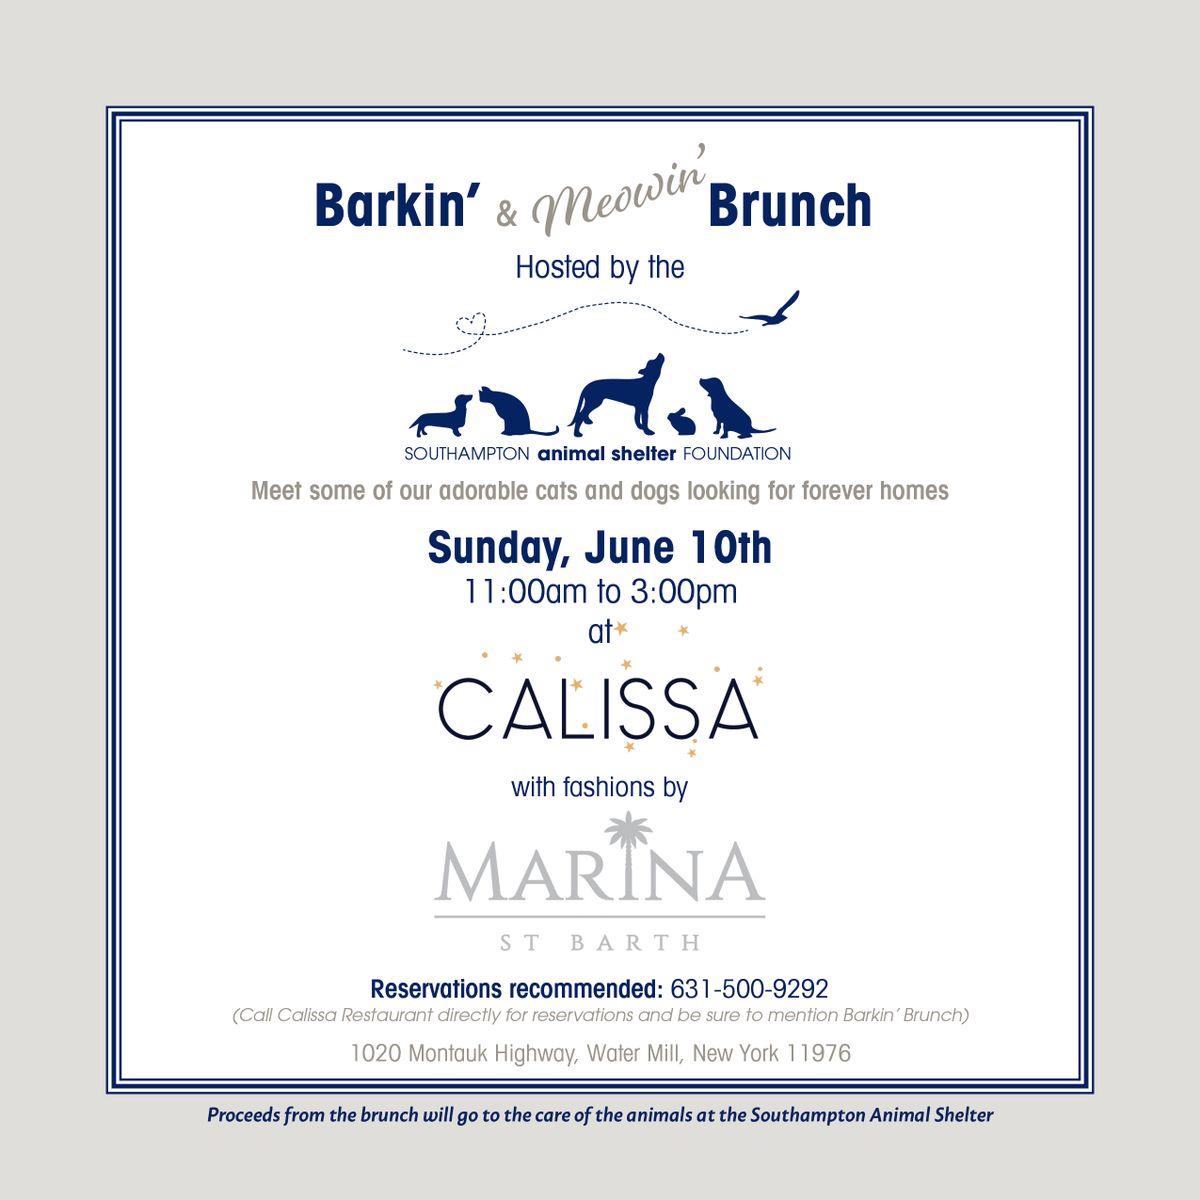 Barkin' Brunch at Calissa